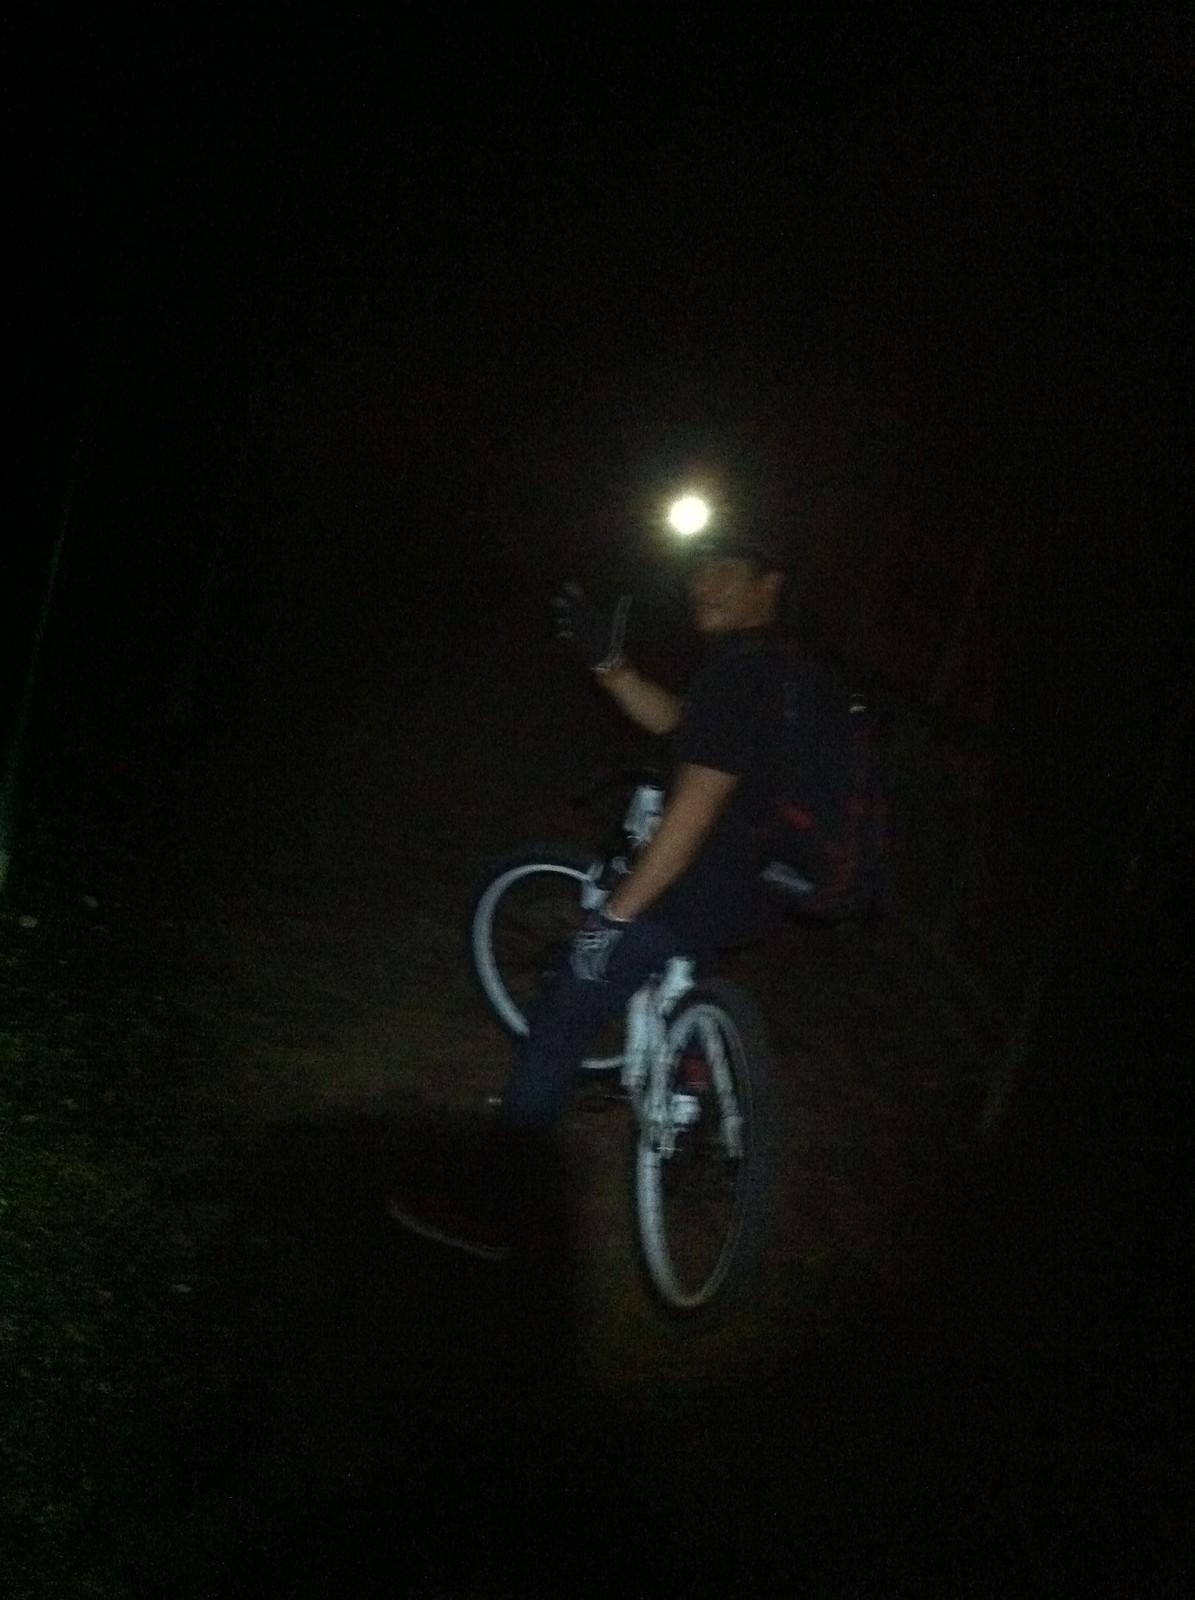 IMG 0664 - ragaboi - Mountain Biking Pictures - Vital MTB